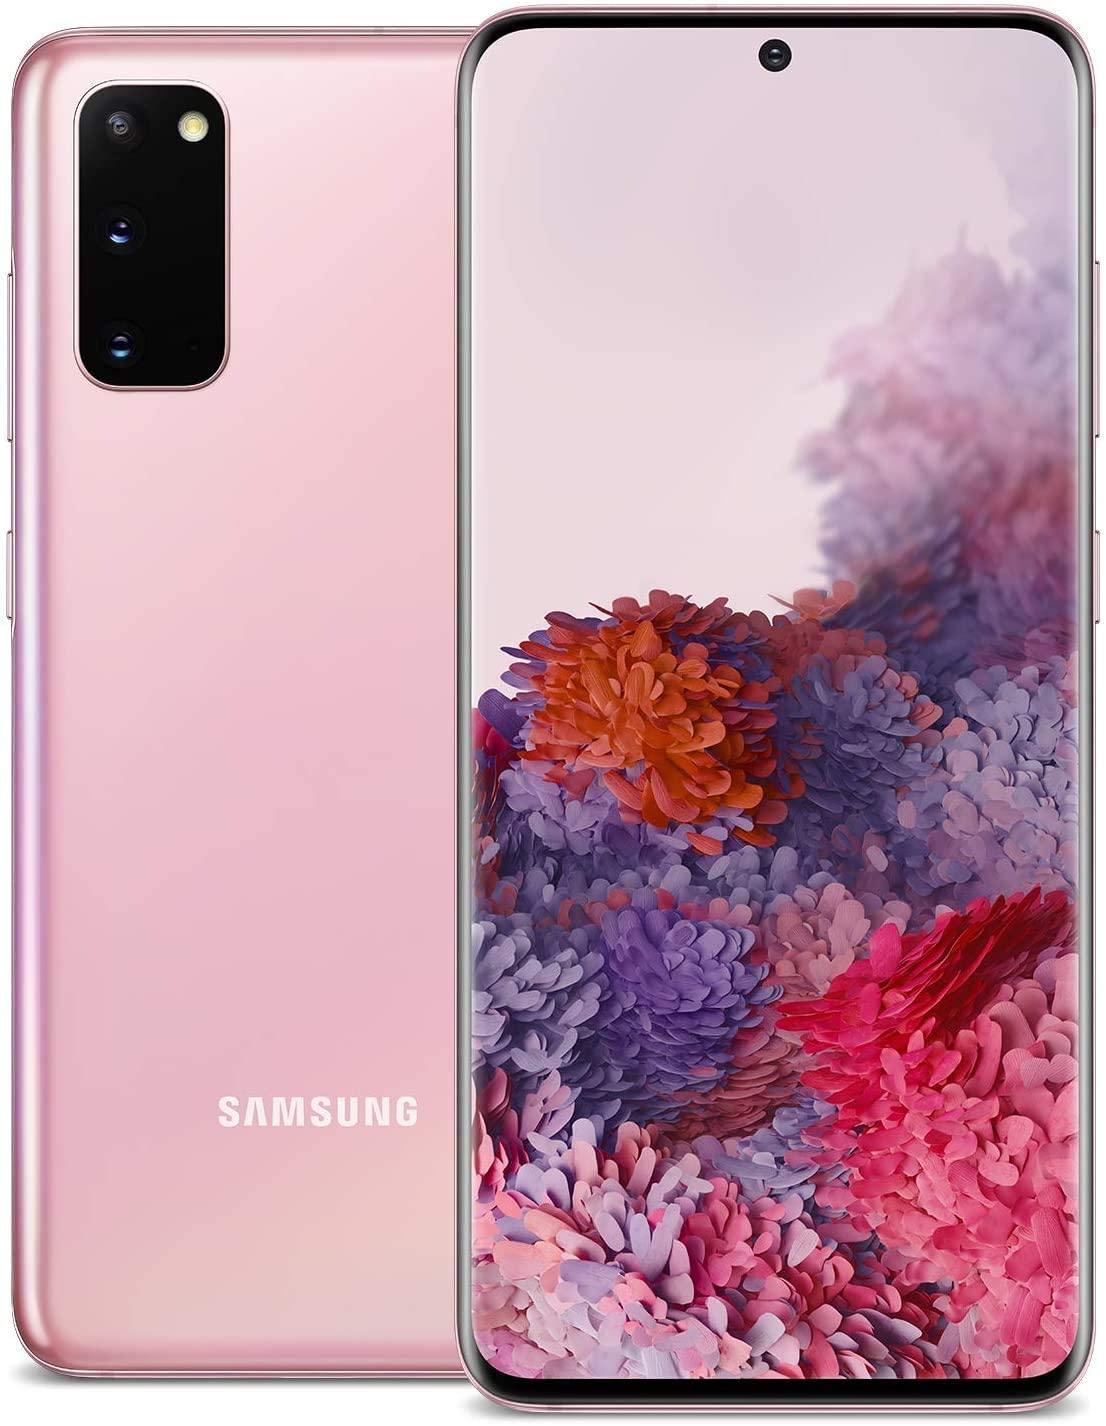 Samsung Galaxy S20 5G, 128GB, Cloud Pink - Totalmente desbloqueado (Renewed)